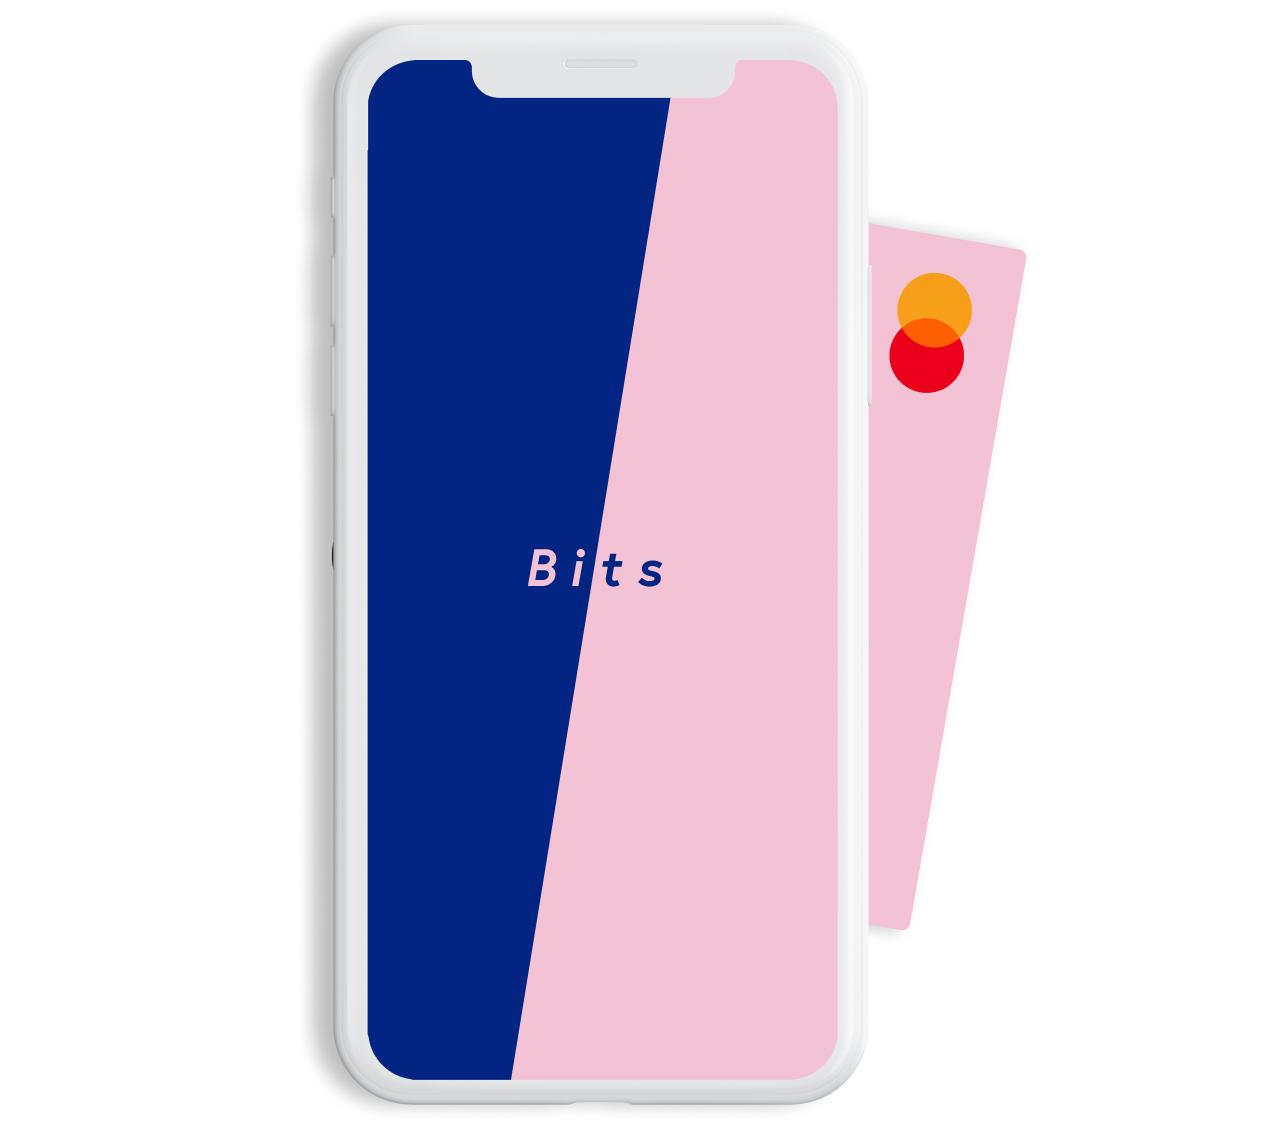 NewBitsLanding.png